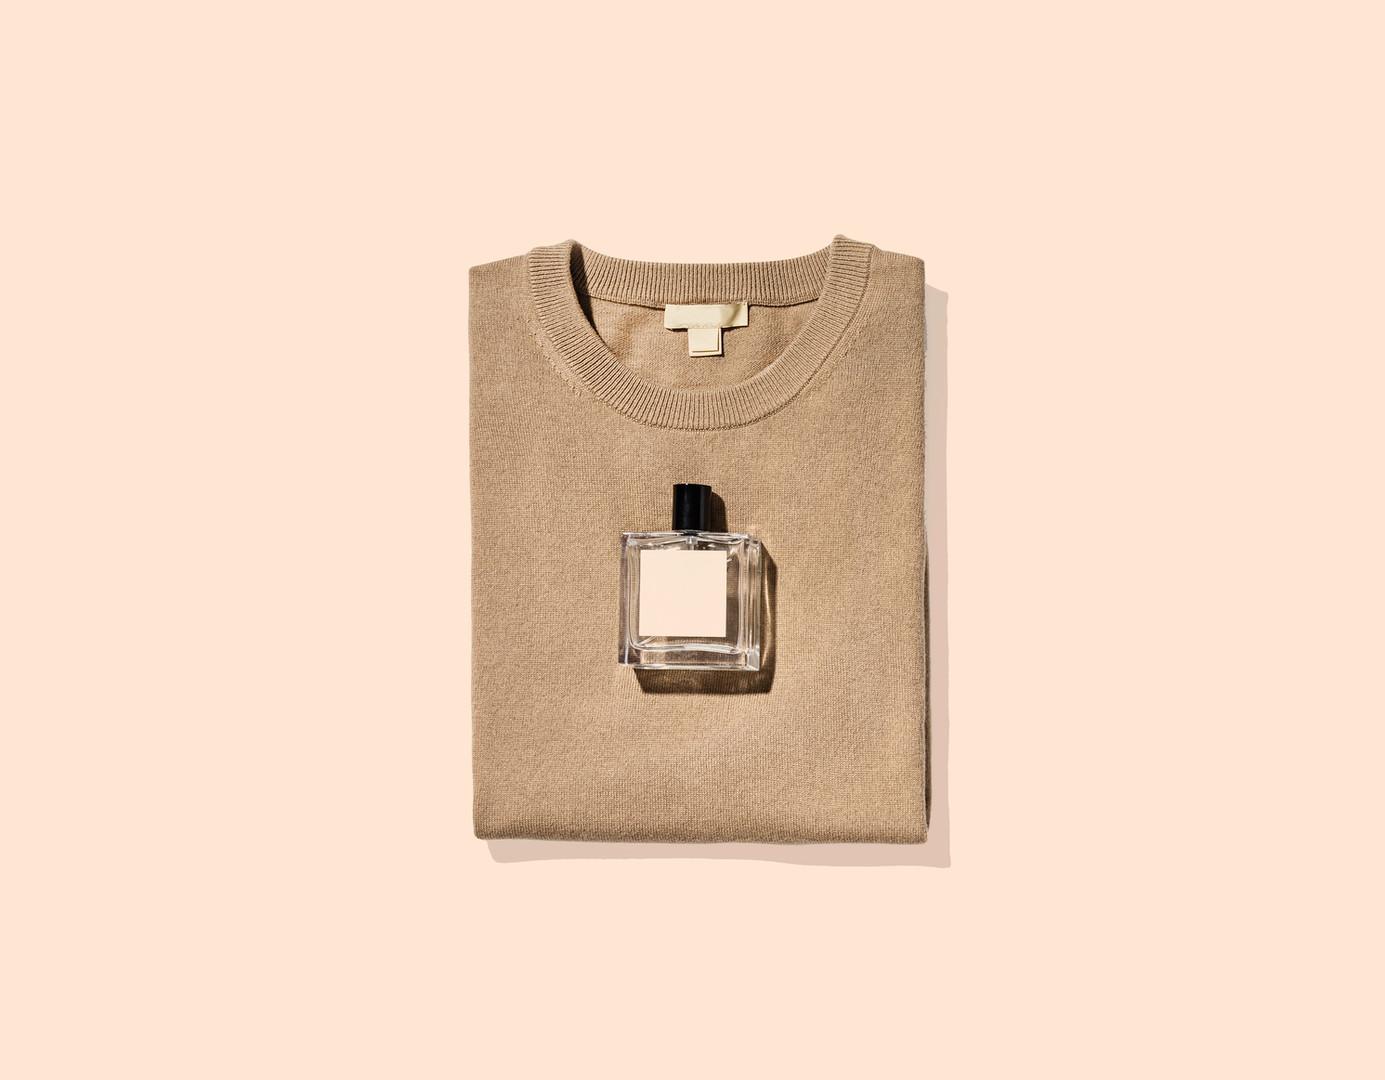 Suéter y Perfumes